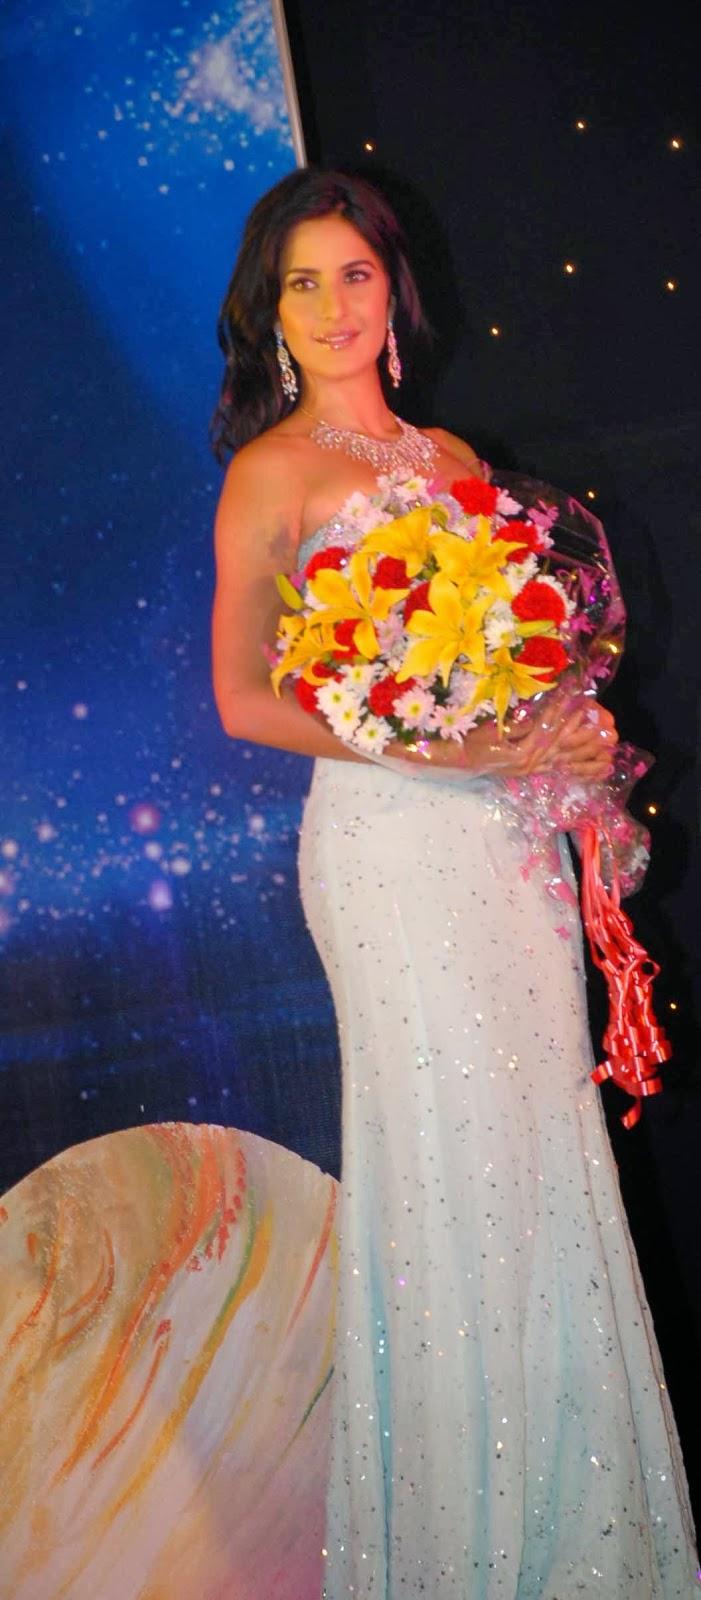 Katrina Kaif Hot Photos - High Resolution Pictures-8754